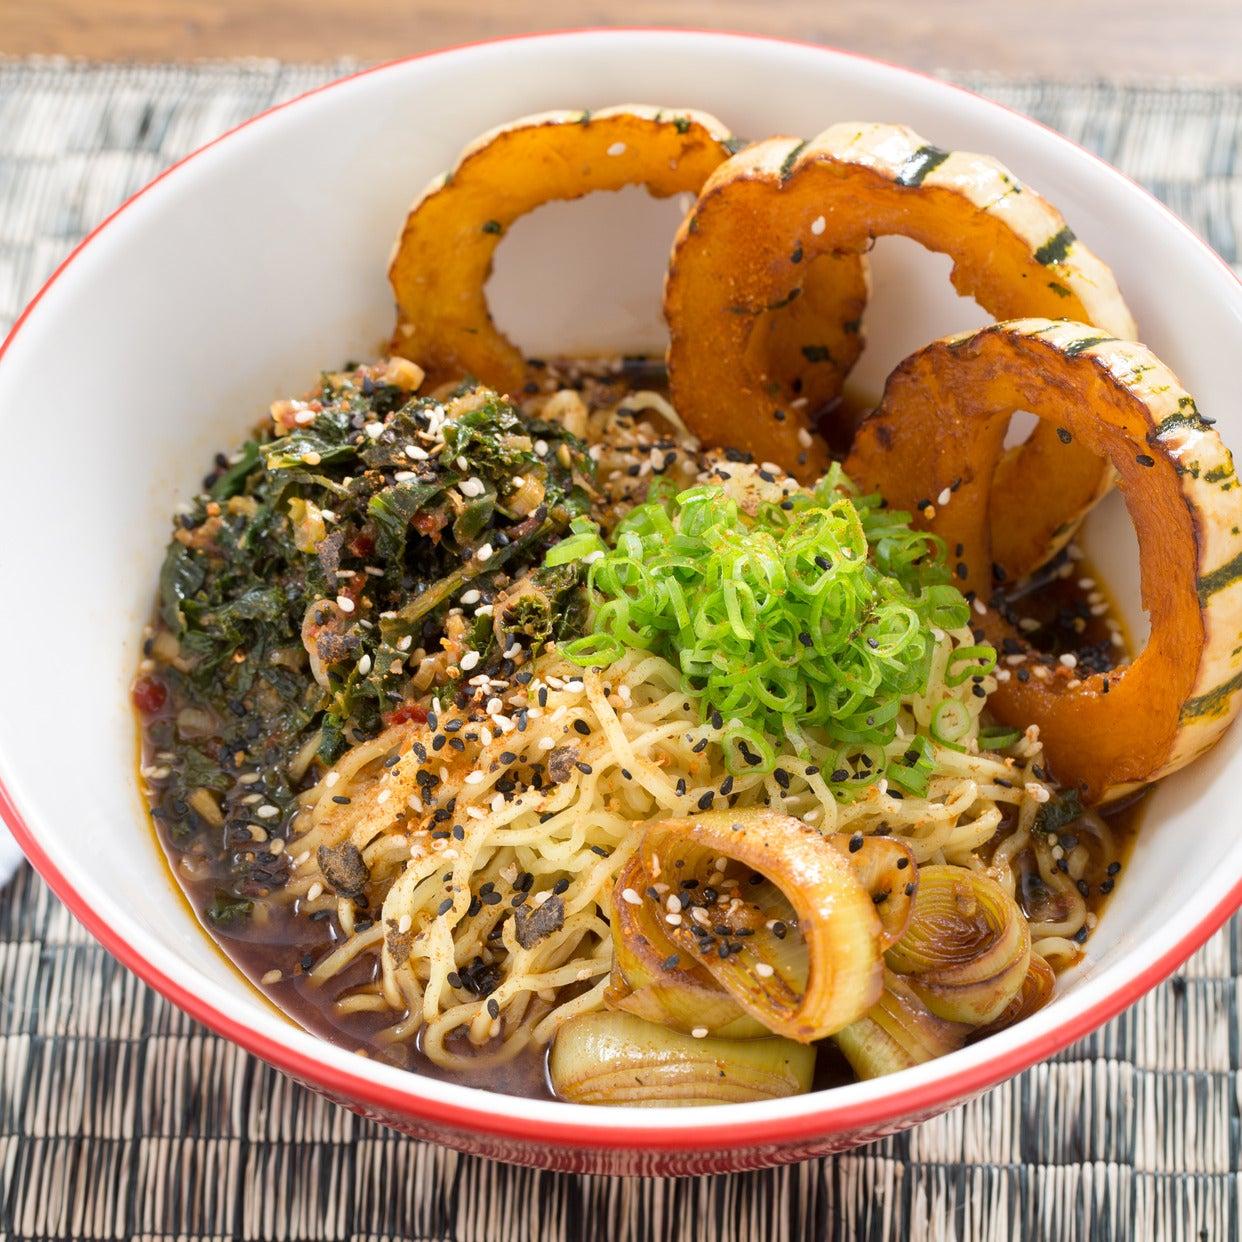 Caramelized Leek & Barley Miso Ramen with Delicata Squash & Fresh Ramen Noodles